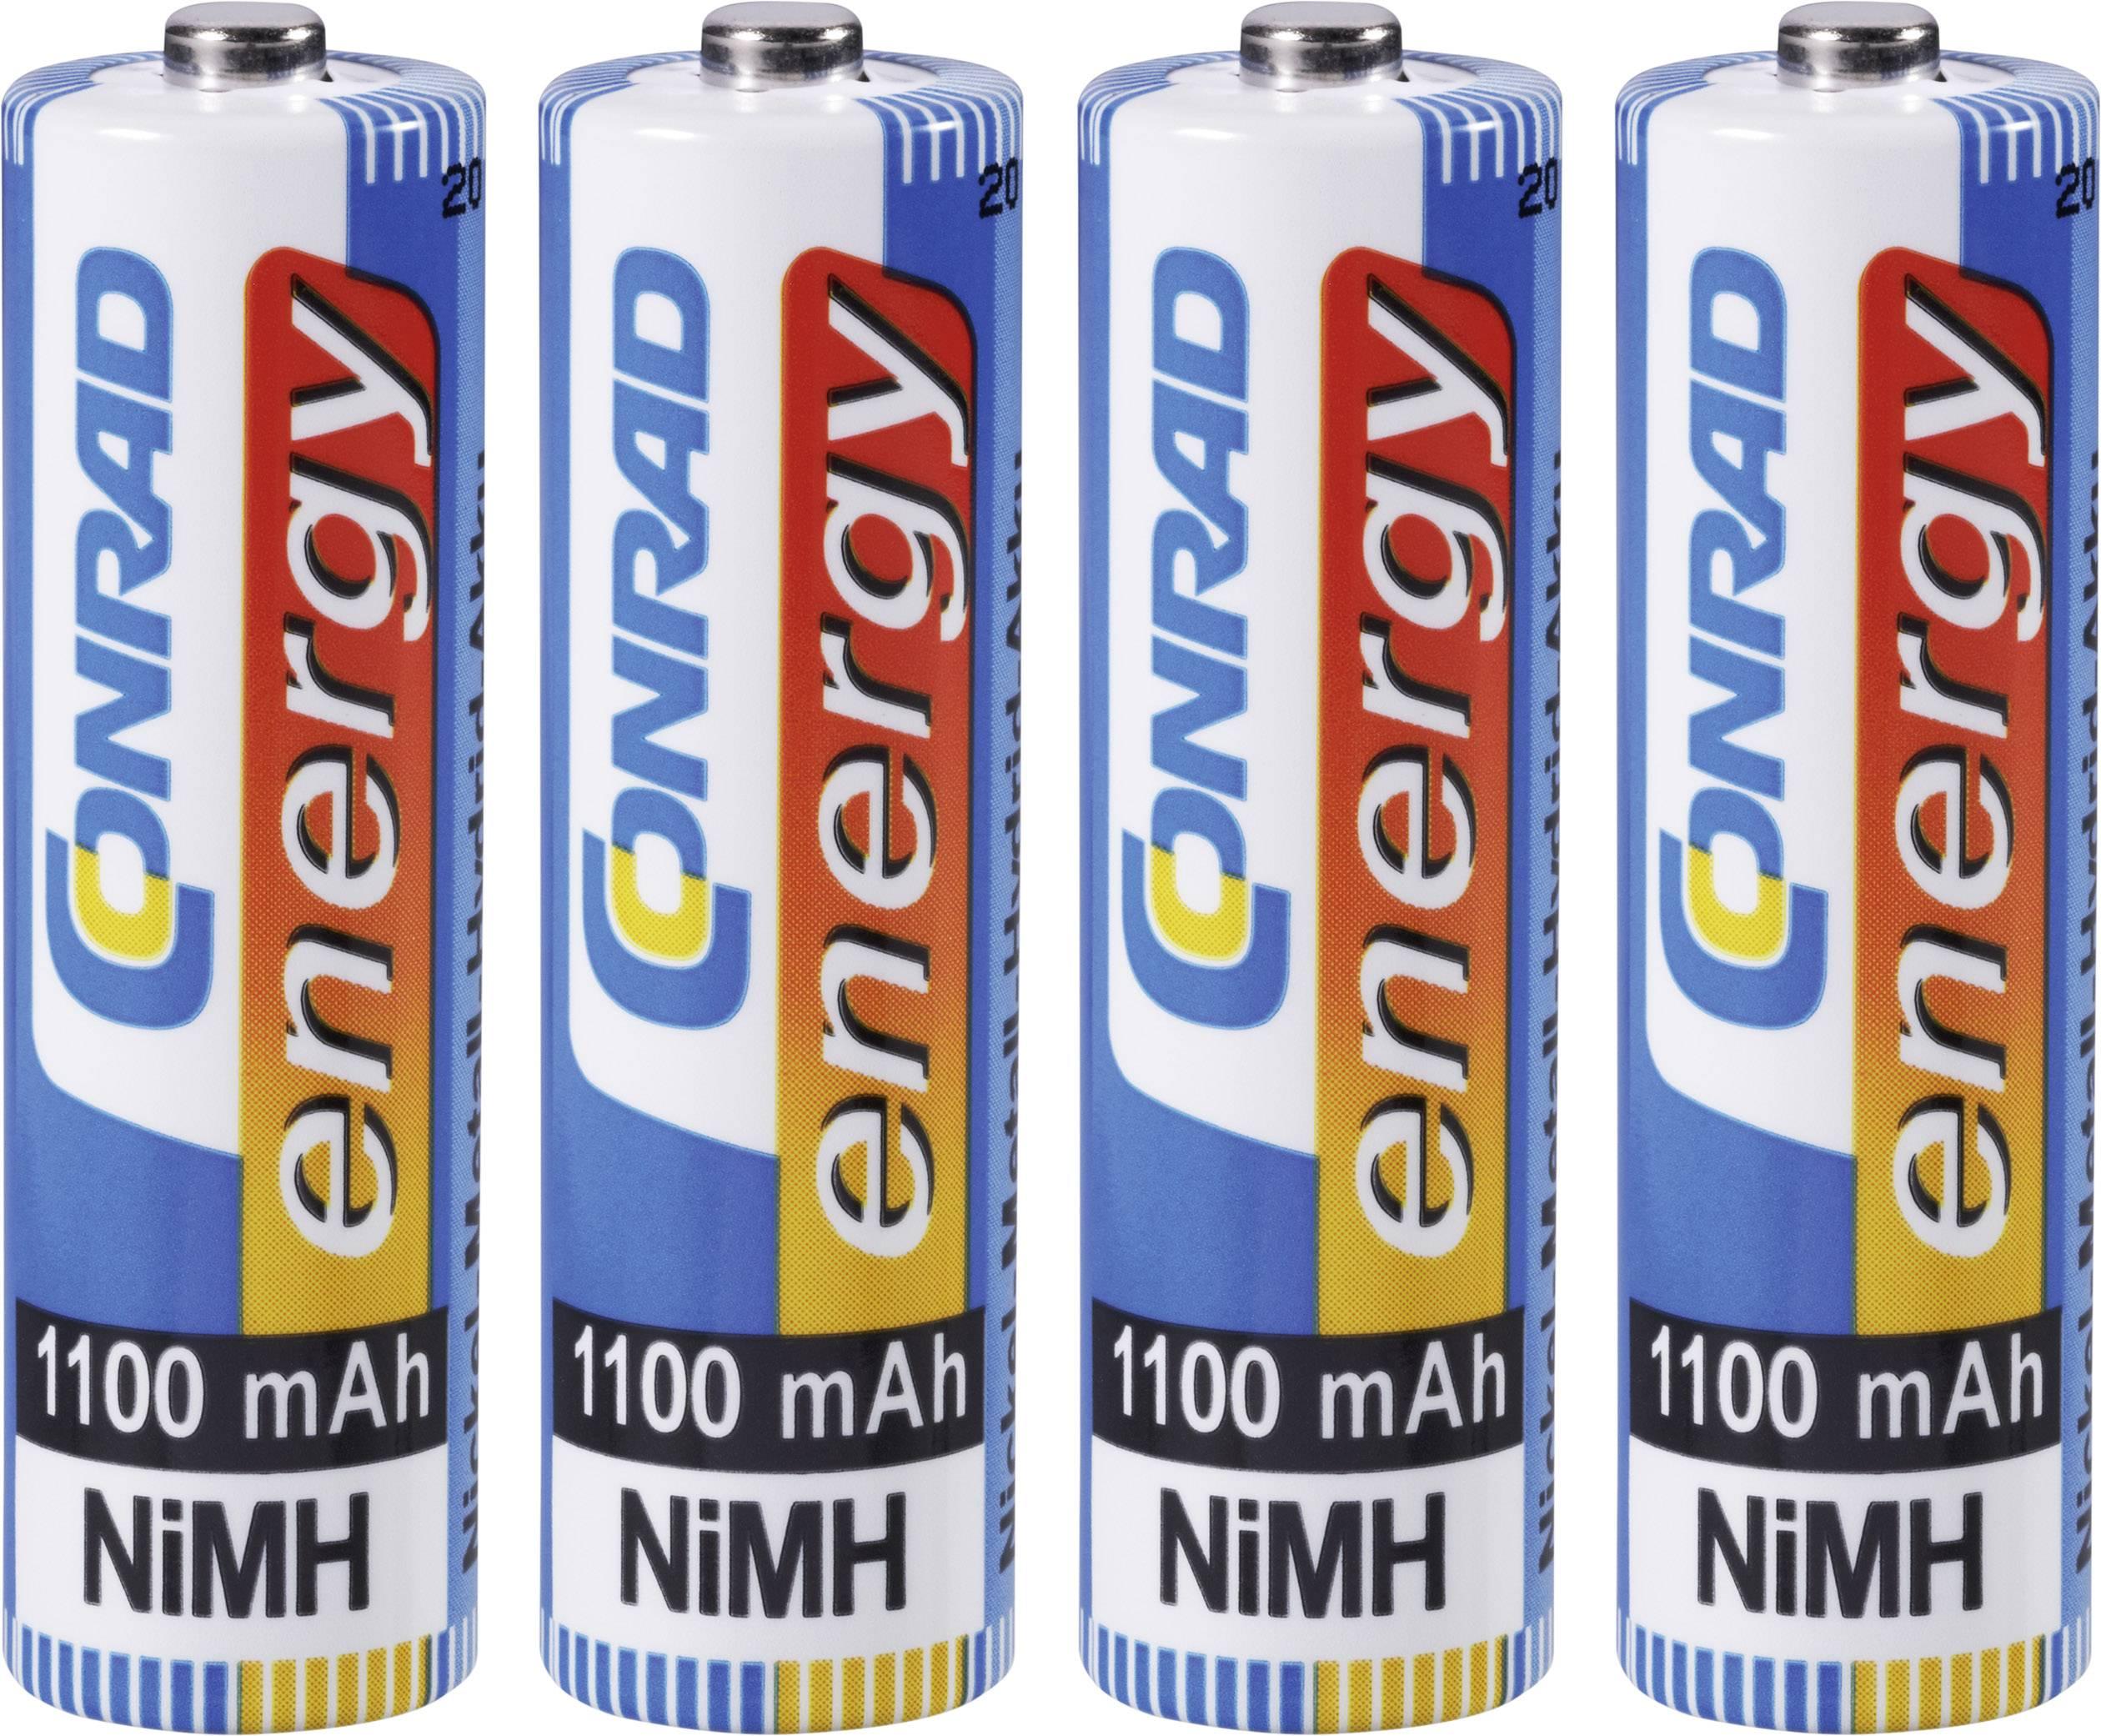 Sada 4 kusov NiMH mignon akumulátorov Conrad Energy